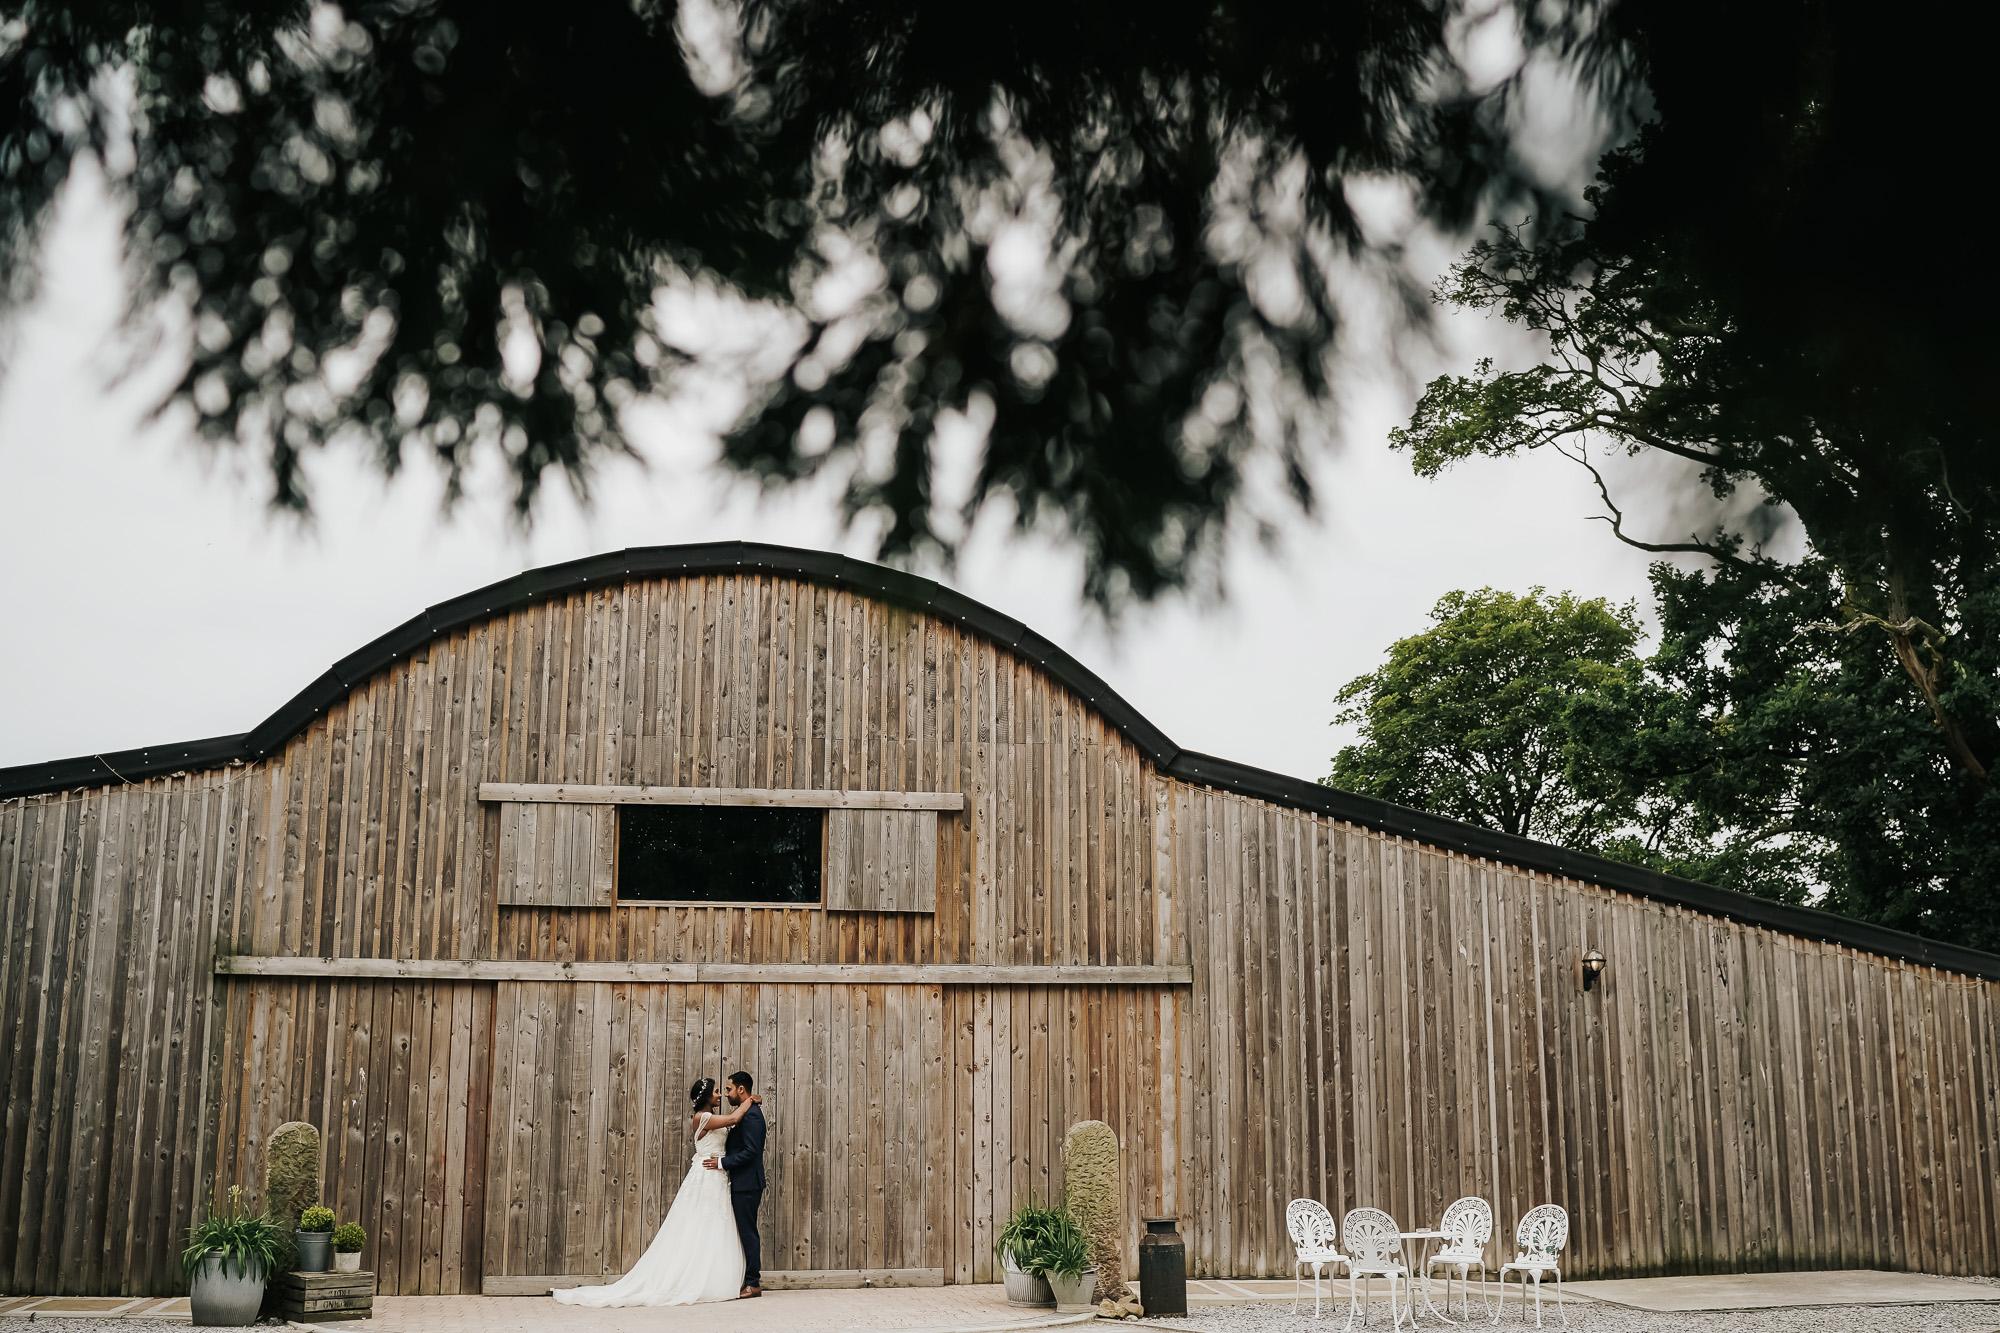 Alcumlow Hall Farm Indian Wedding Photographer (38 of 44).jpg